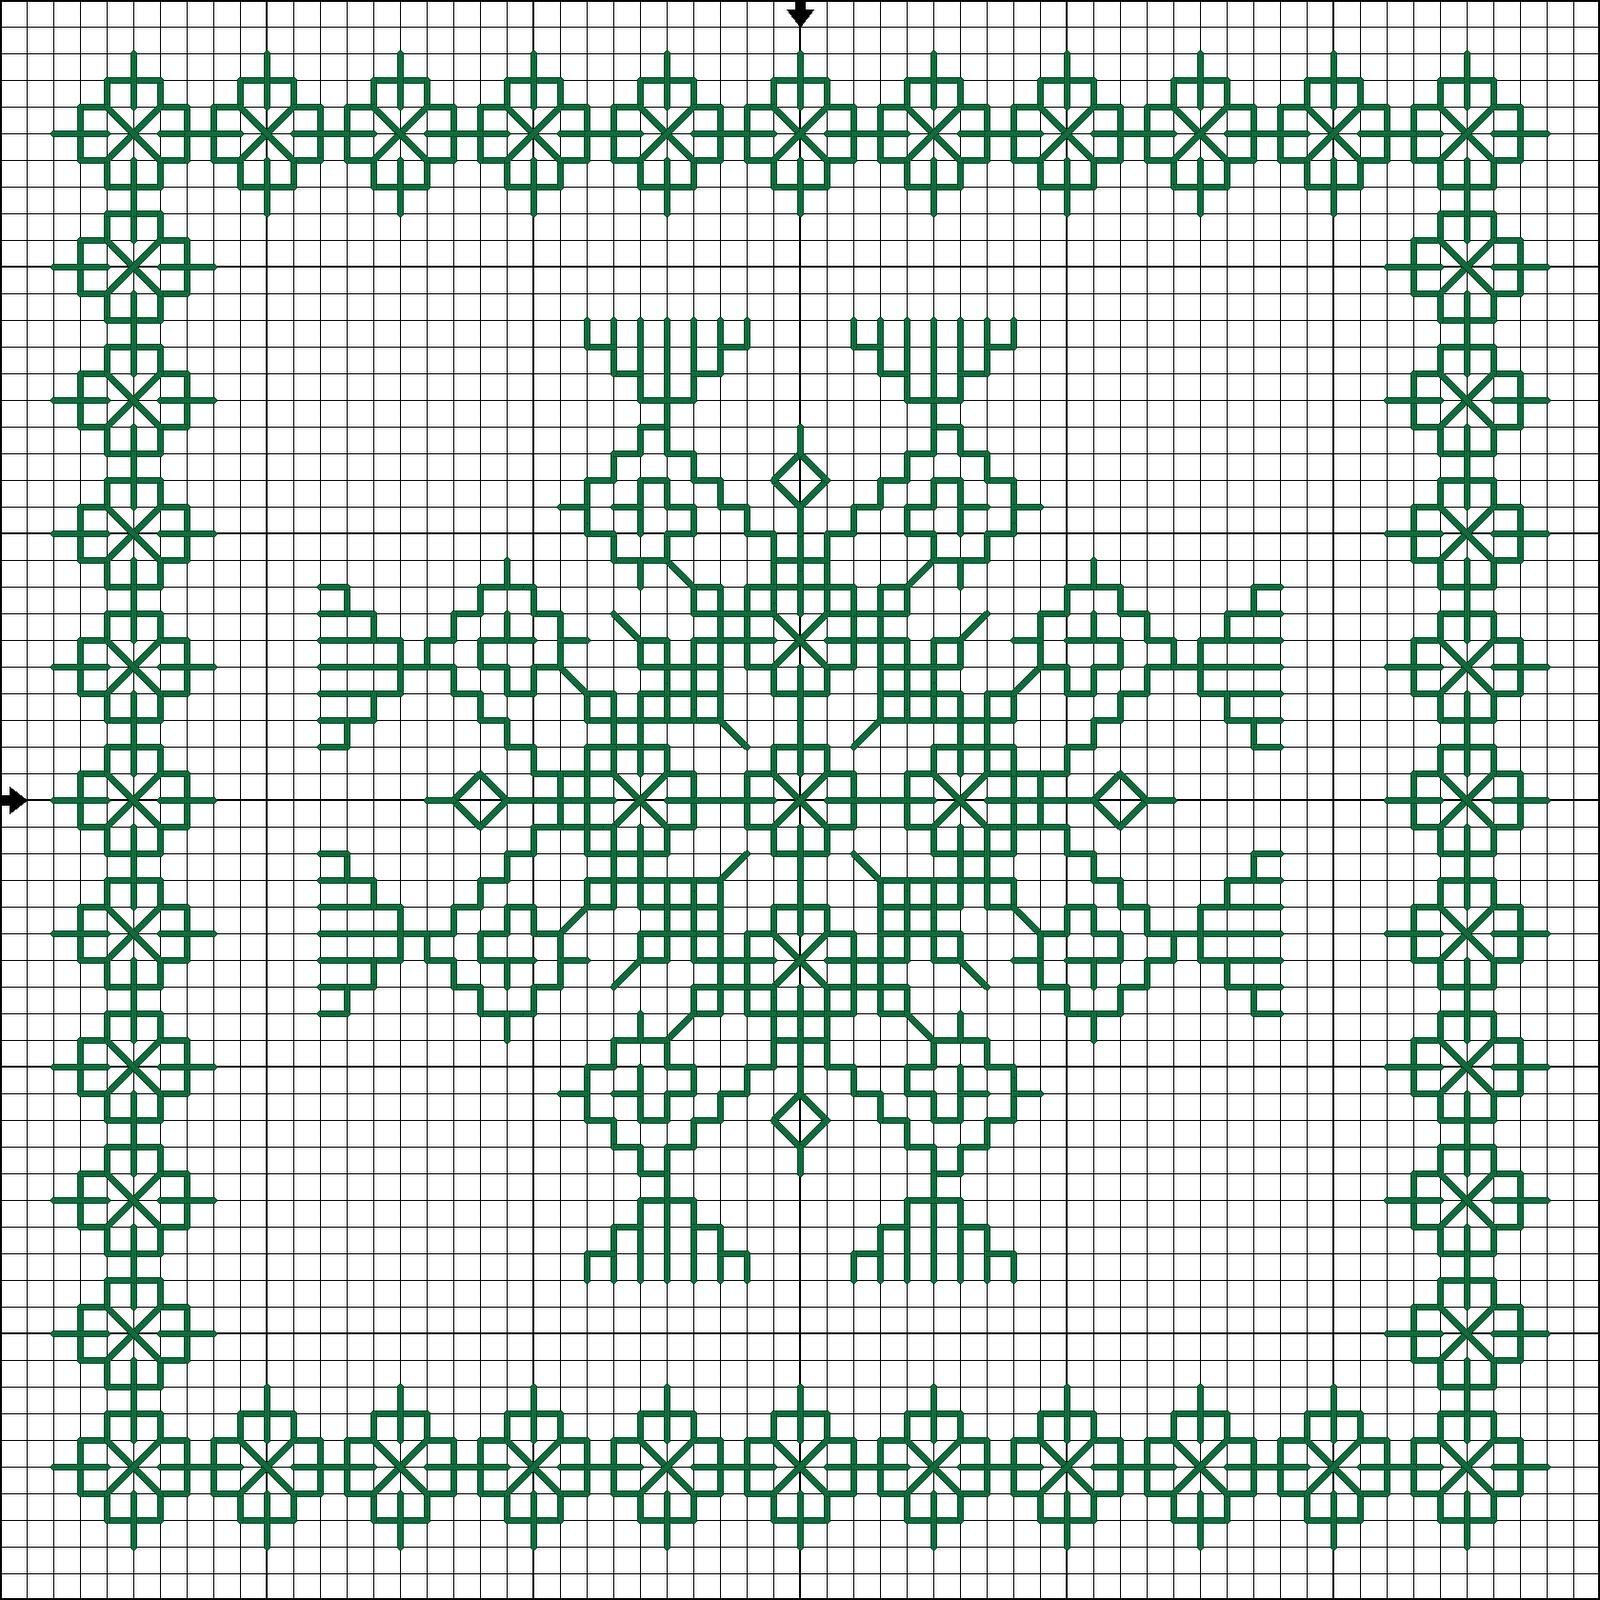 схема для бискорню индийский орнамент